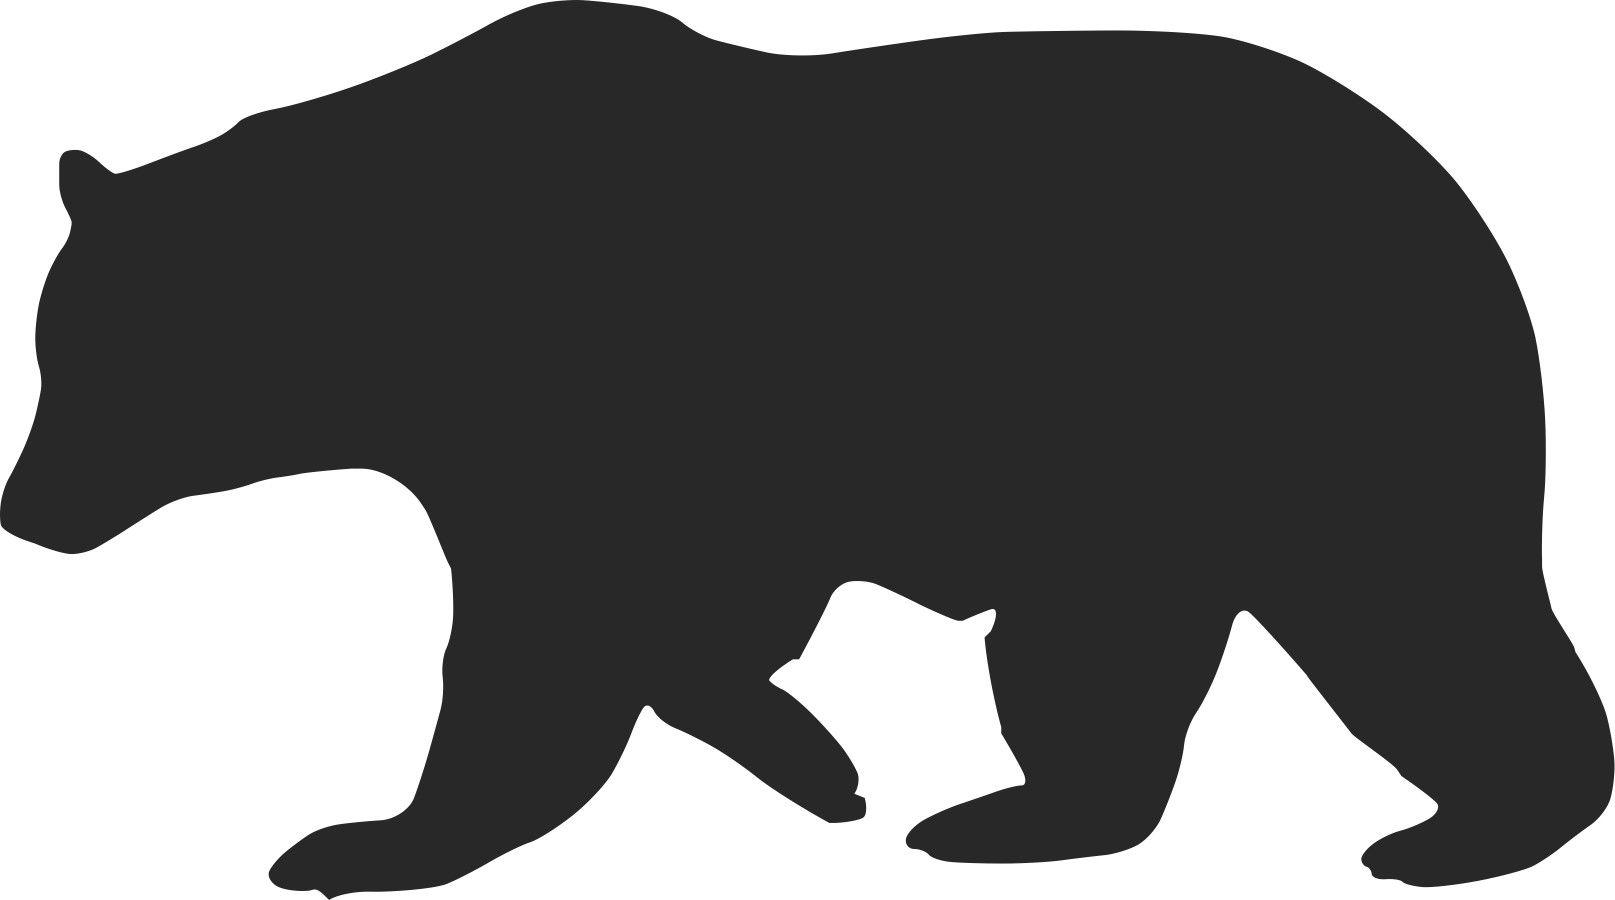 Bear clipart silhouette. Redesign california s flag